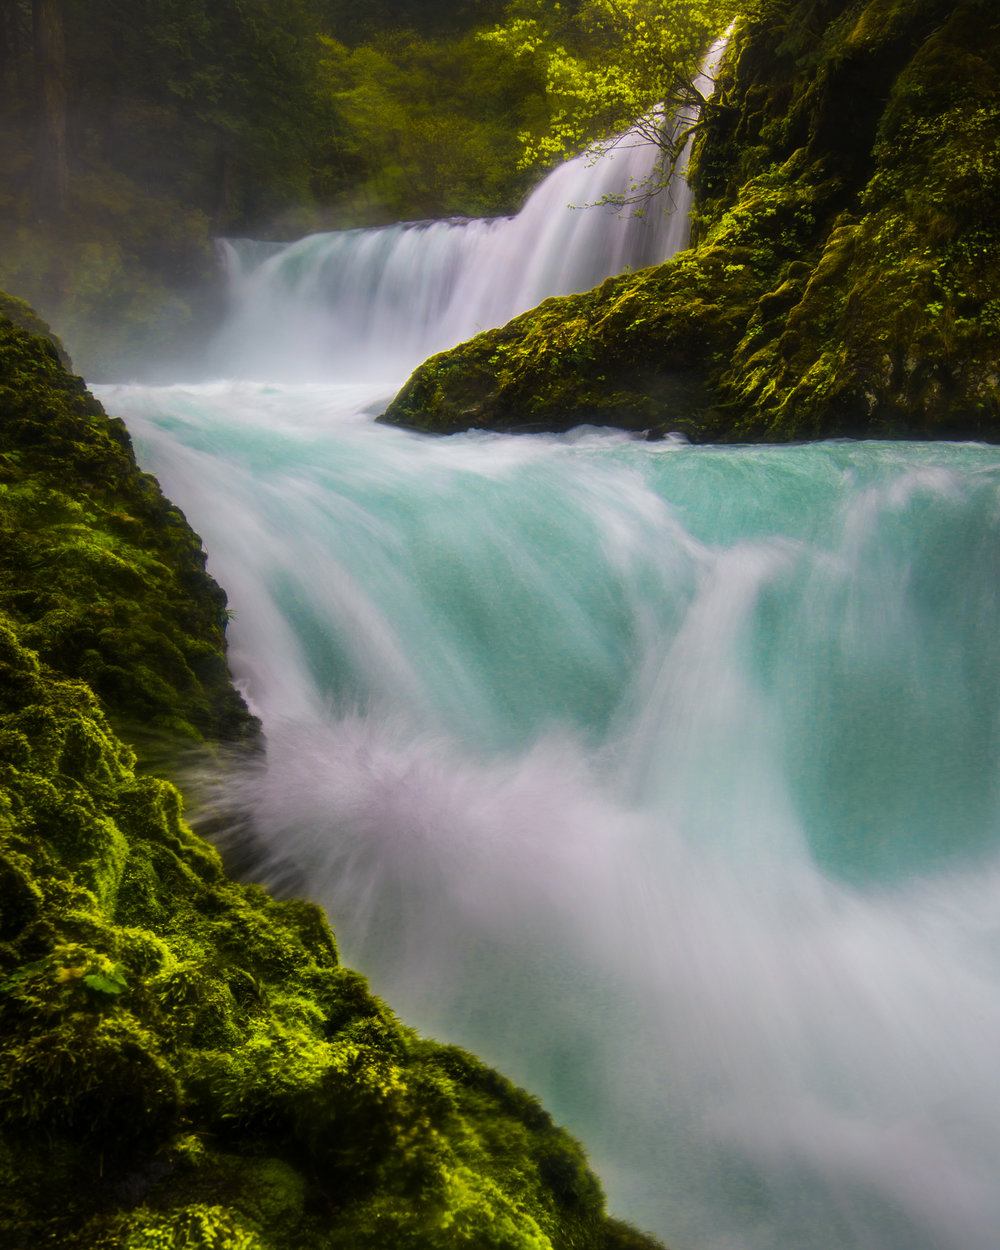 Oregon_042717._CVB9315-Edit.jpg